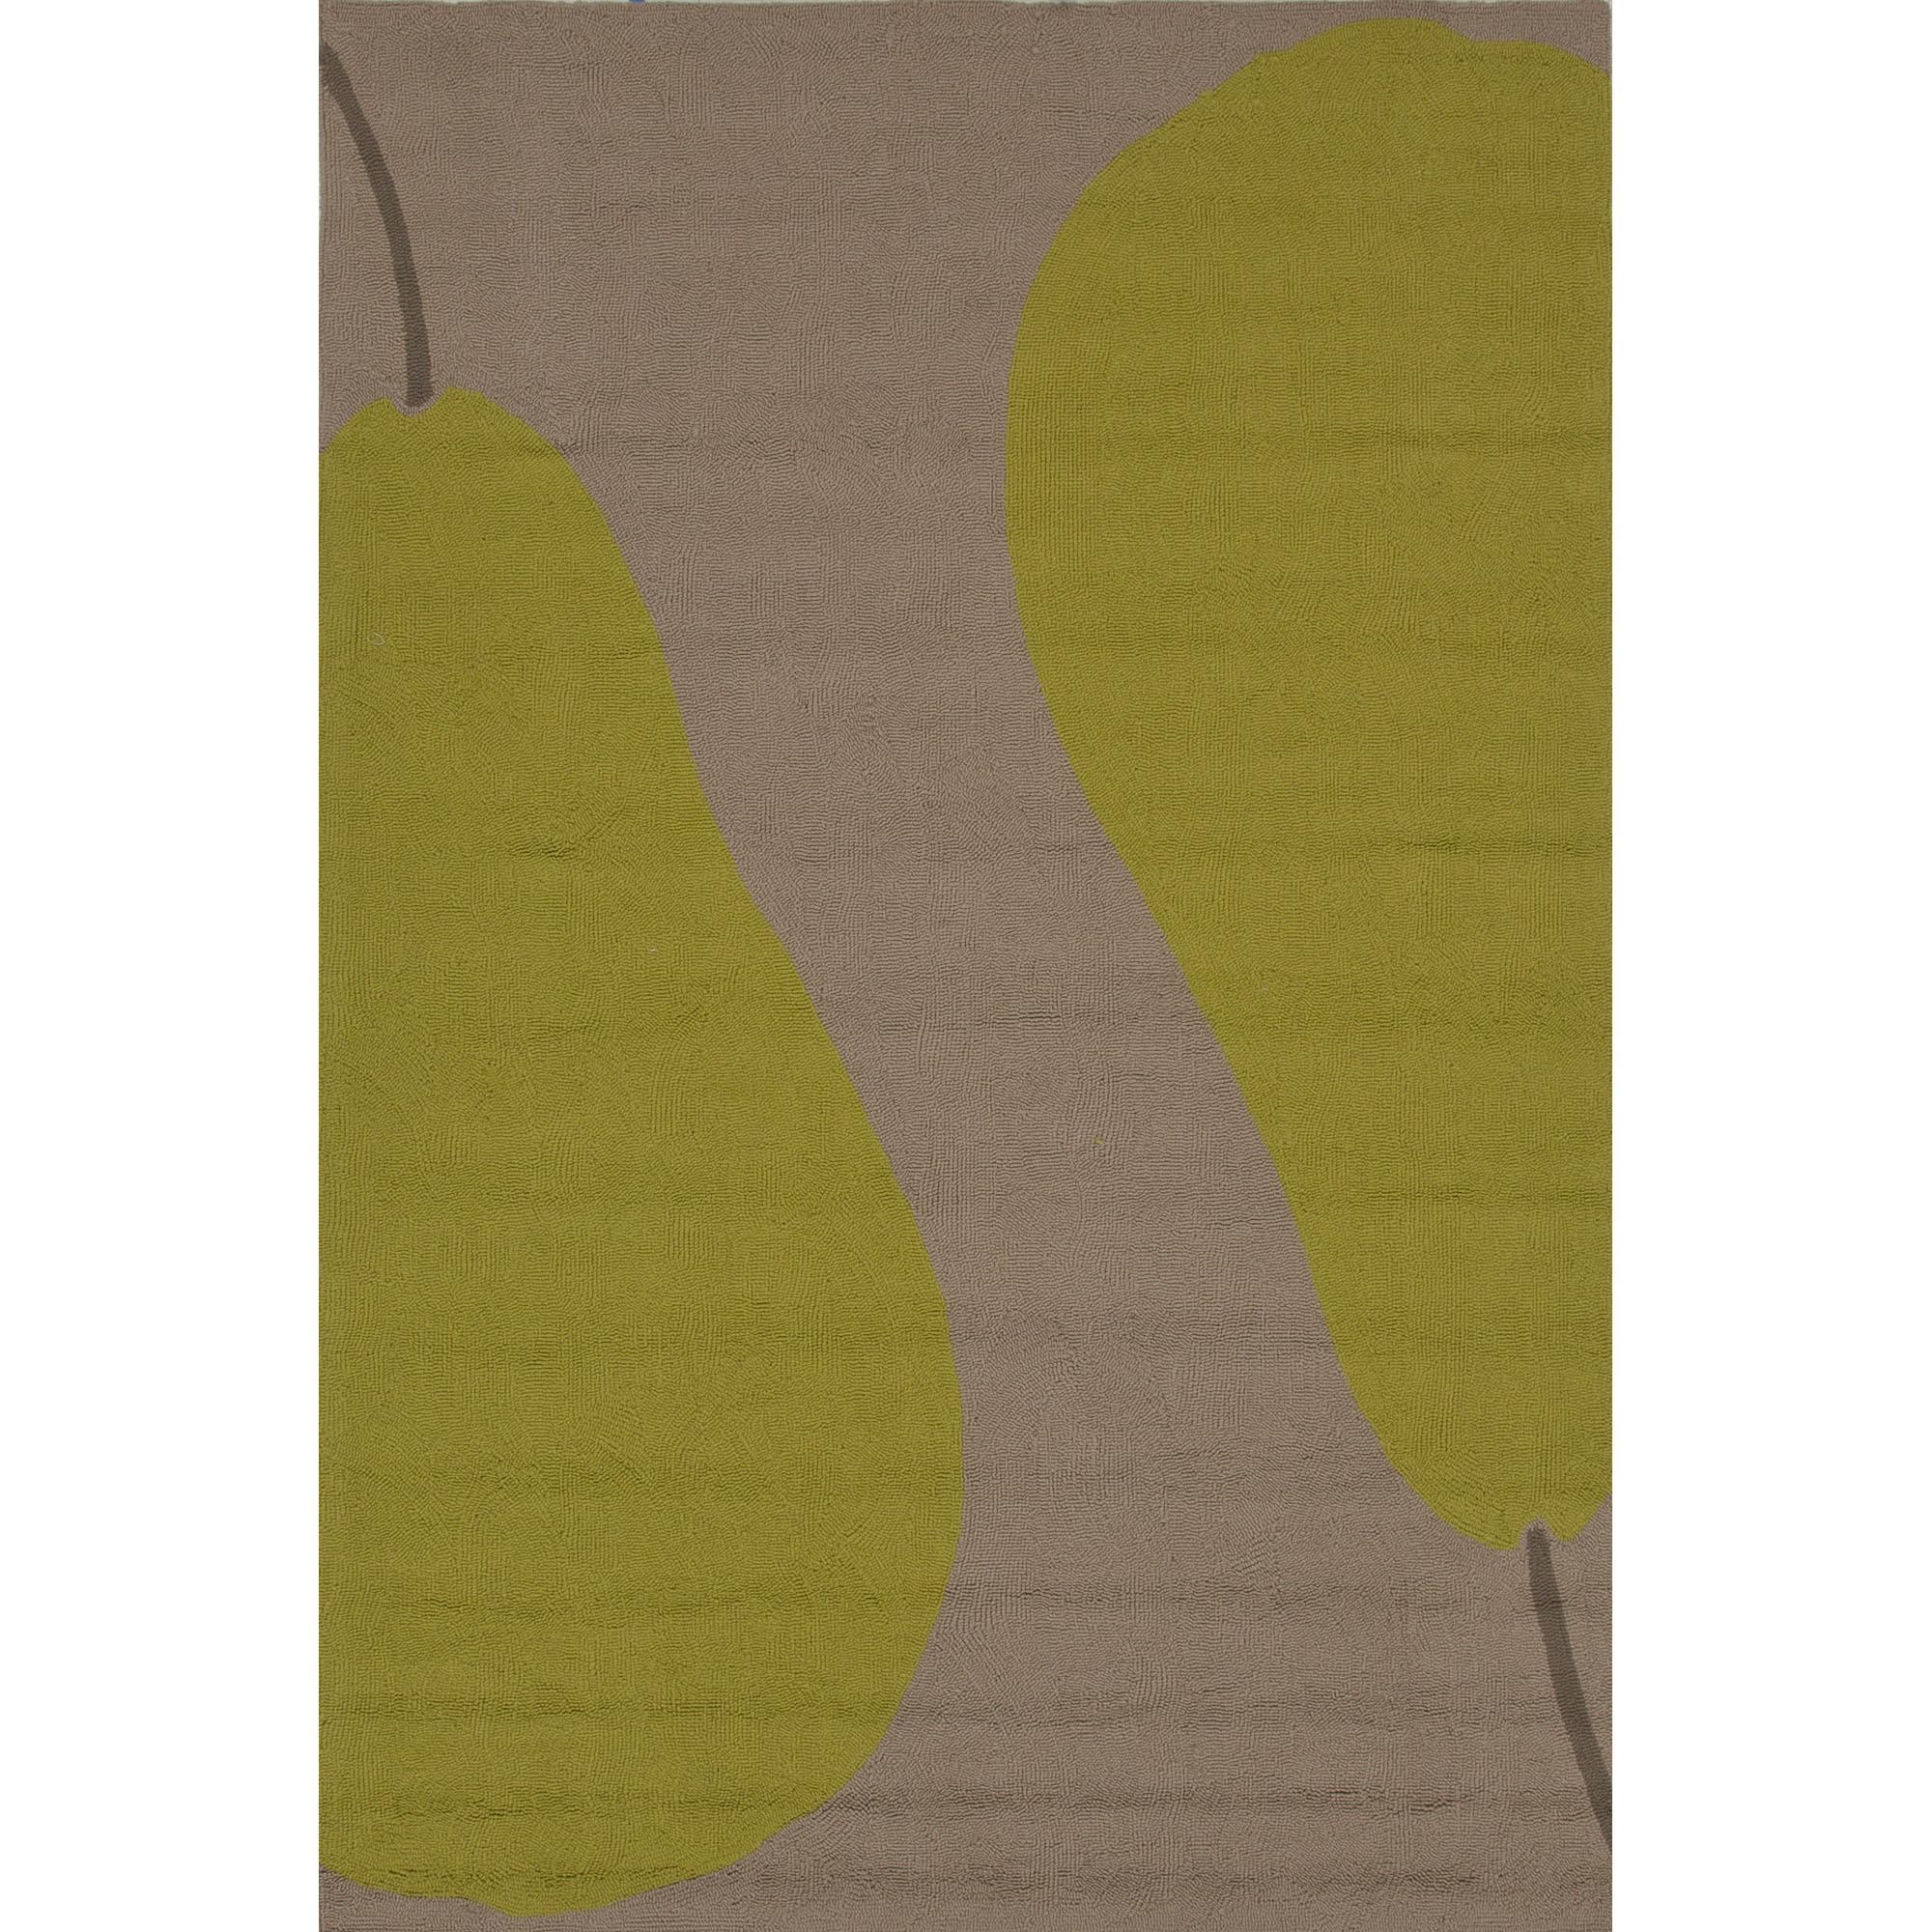 JAIPUR Rugs Grant I-o 7.6 x 9.6 Rug - Item Number: RUG101897